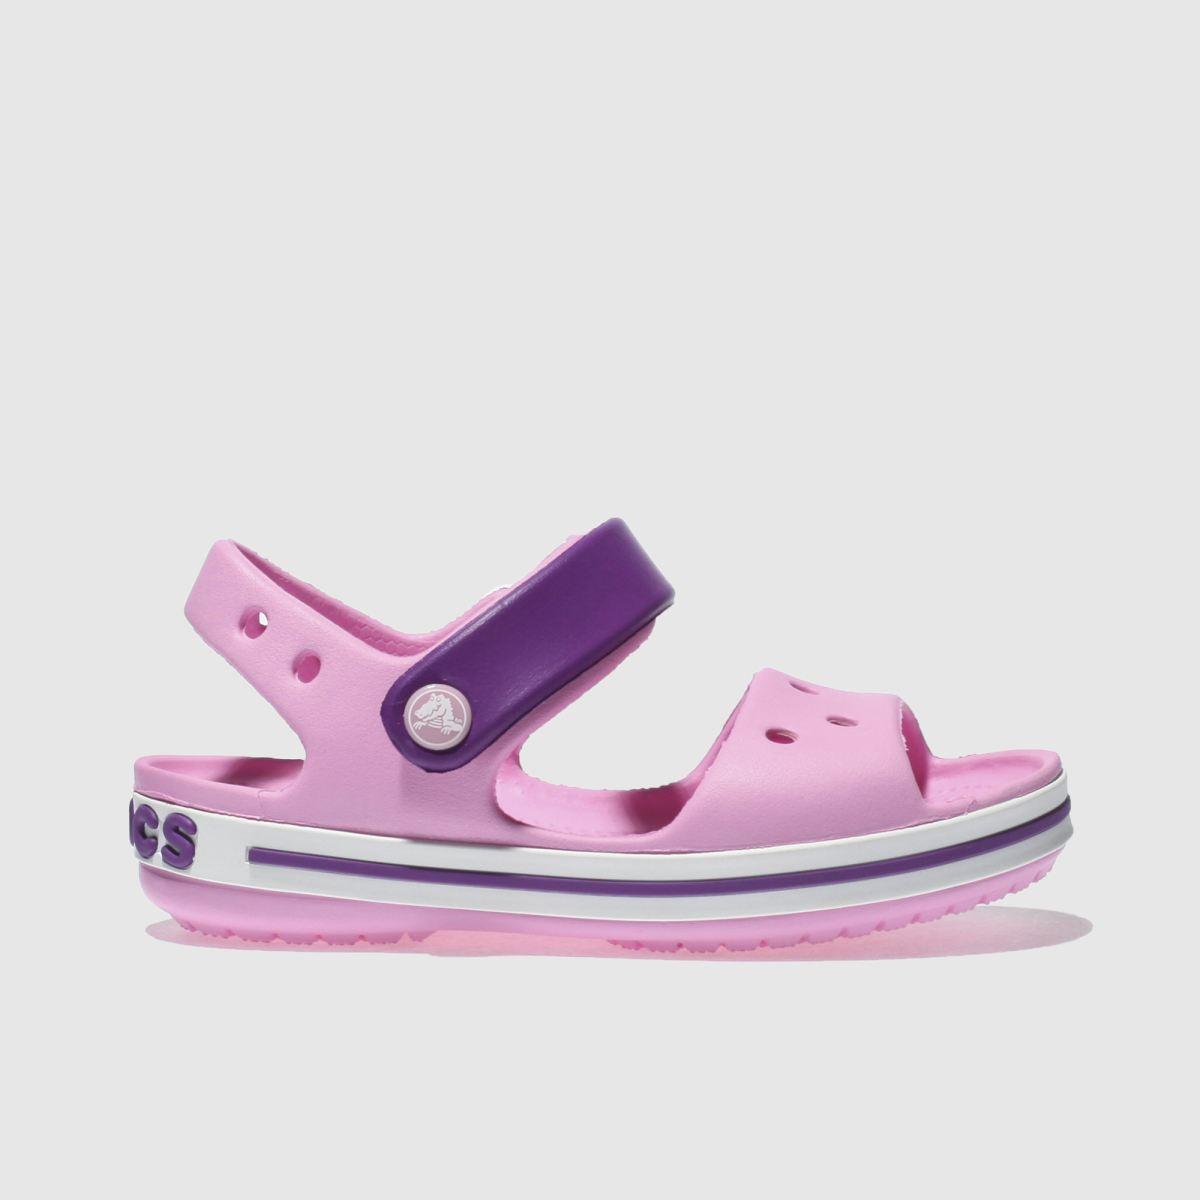 Crocs Crocs Pale Pink Crocband Sandal Girls Junior Sandals